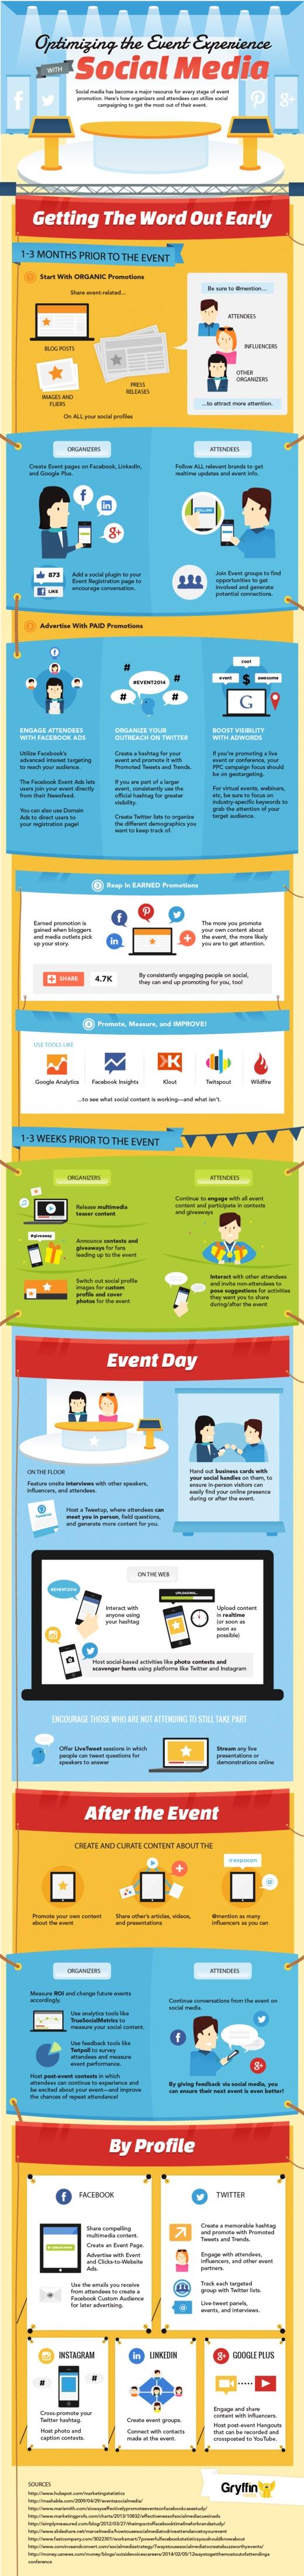 social media event promotion